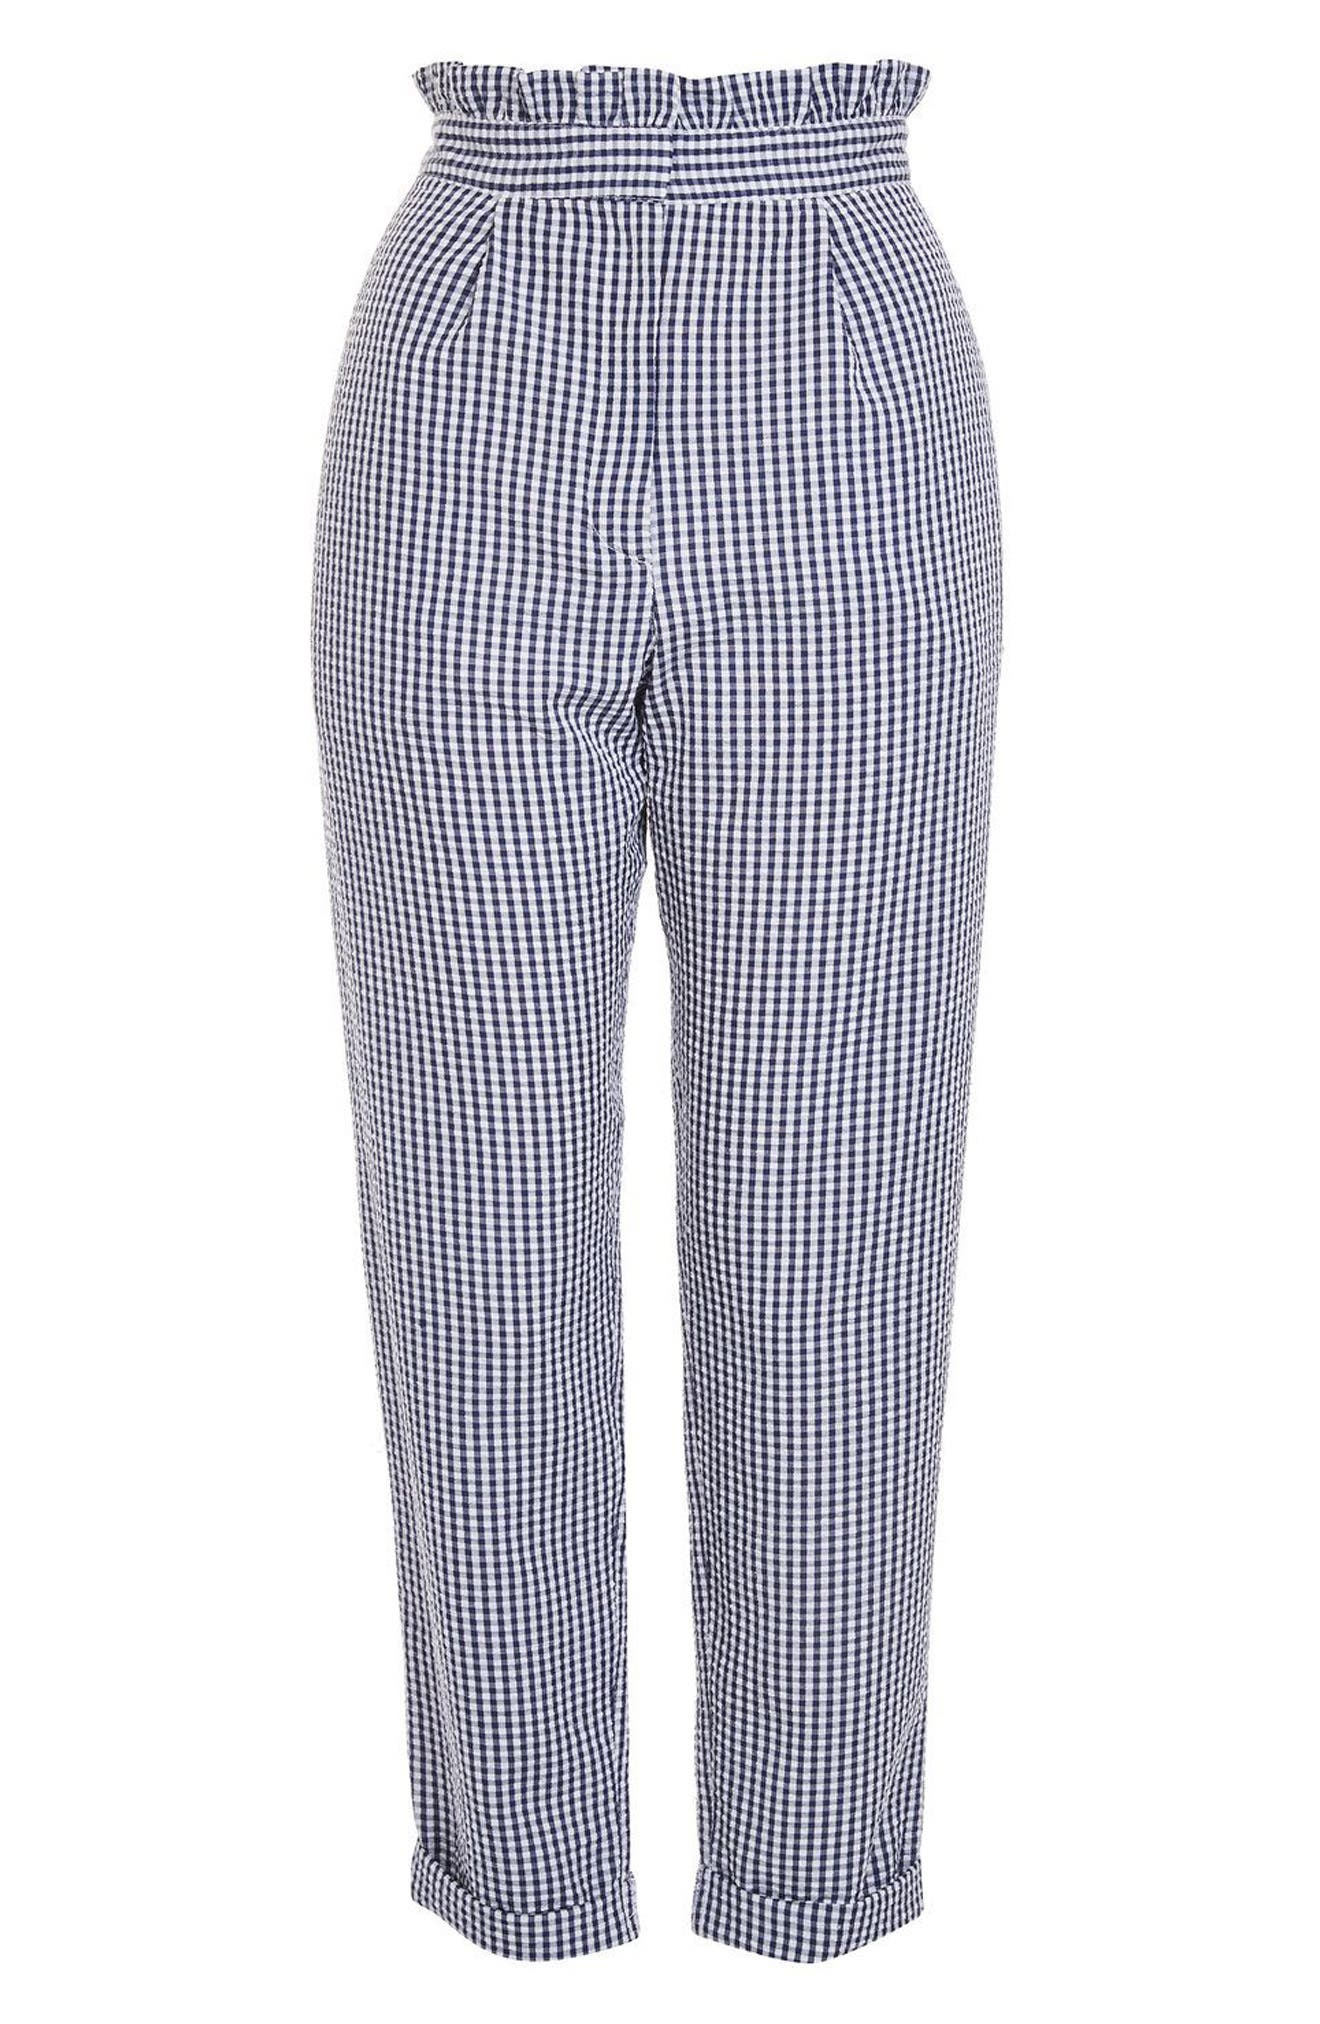 Alternate Image 3  - Topshop Ruffle Waist Gingham Trousers